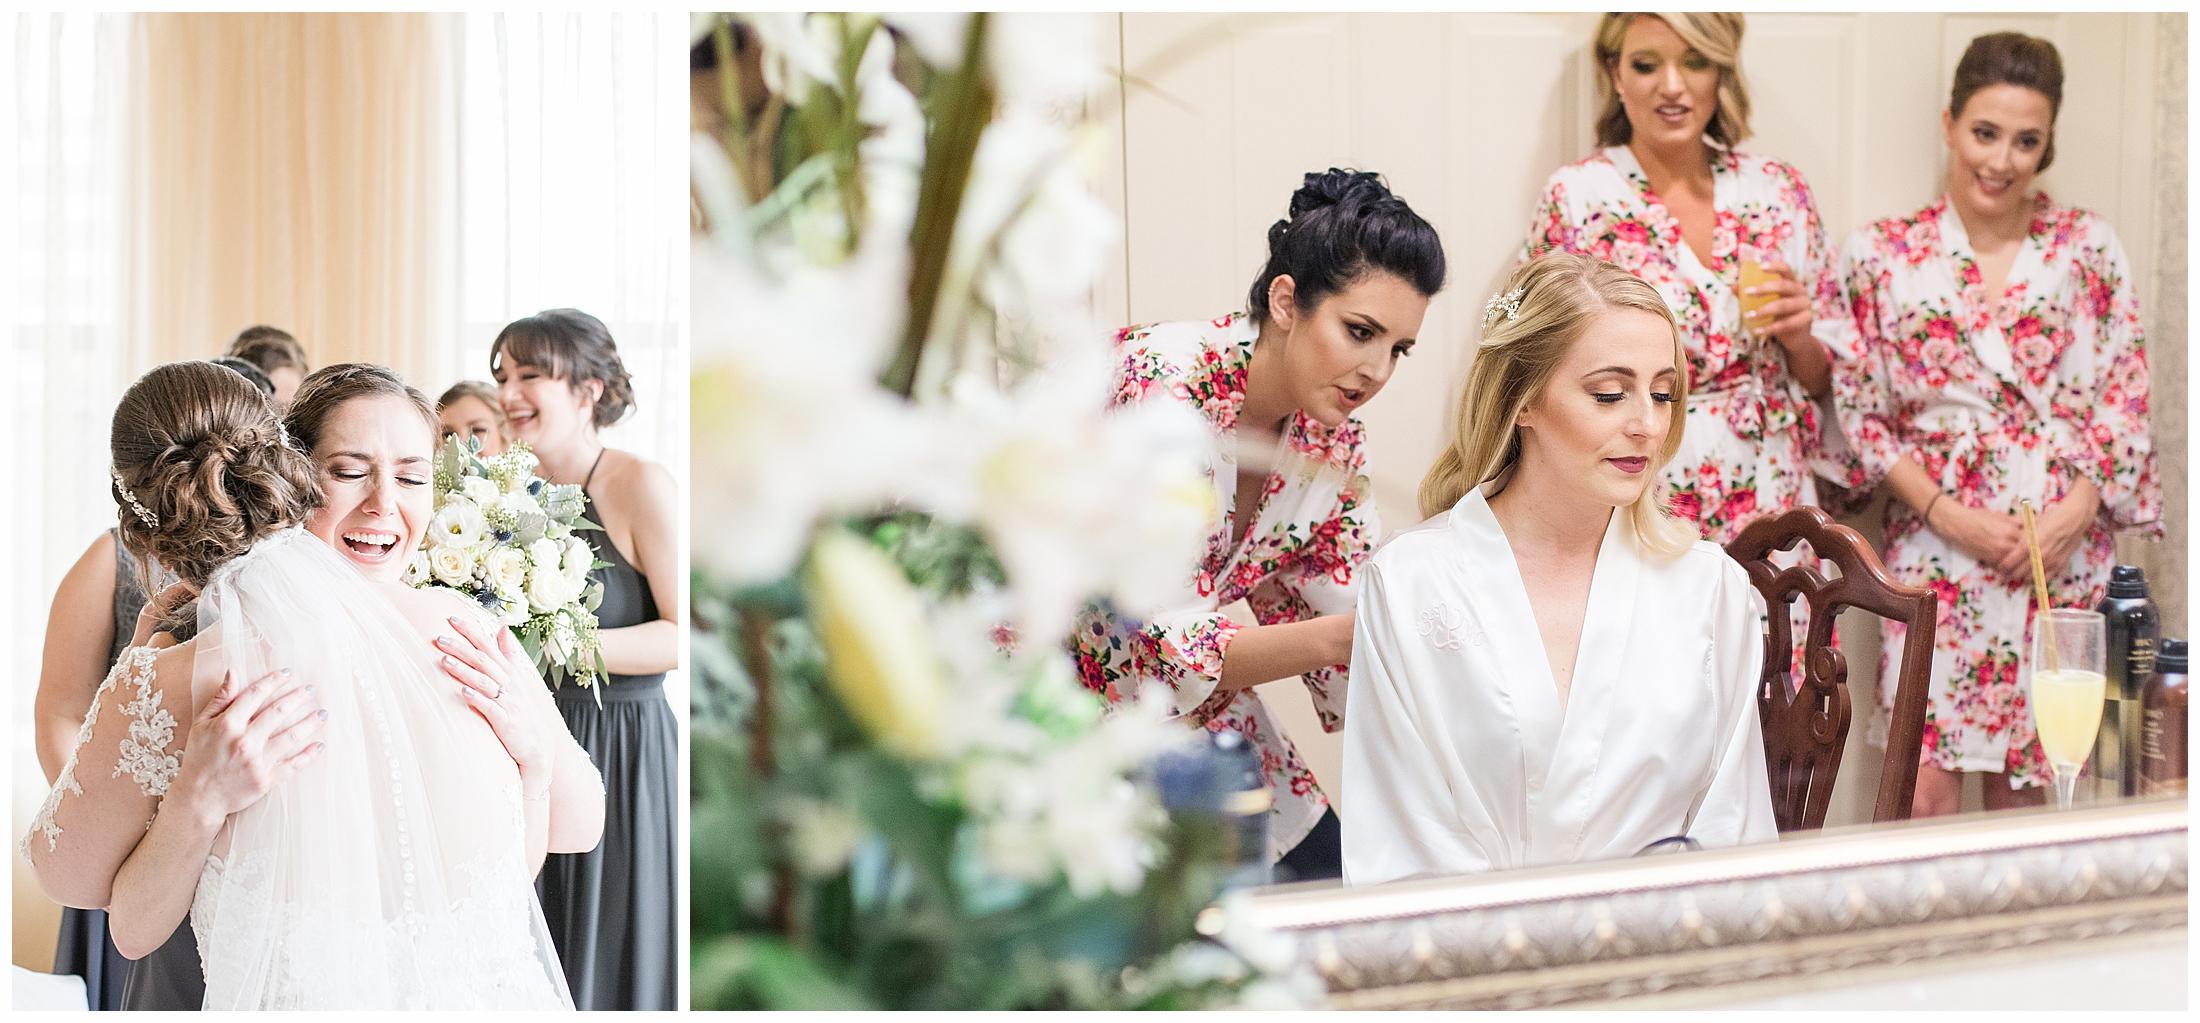 multiple-locations-on-wedding-day-.jpg5.jpg